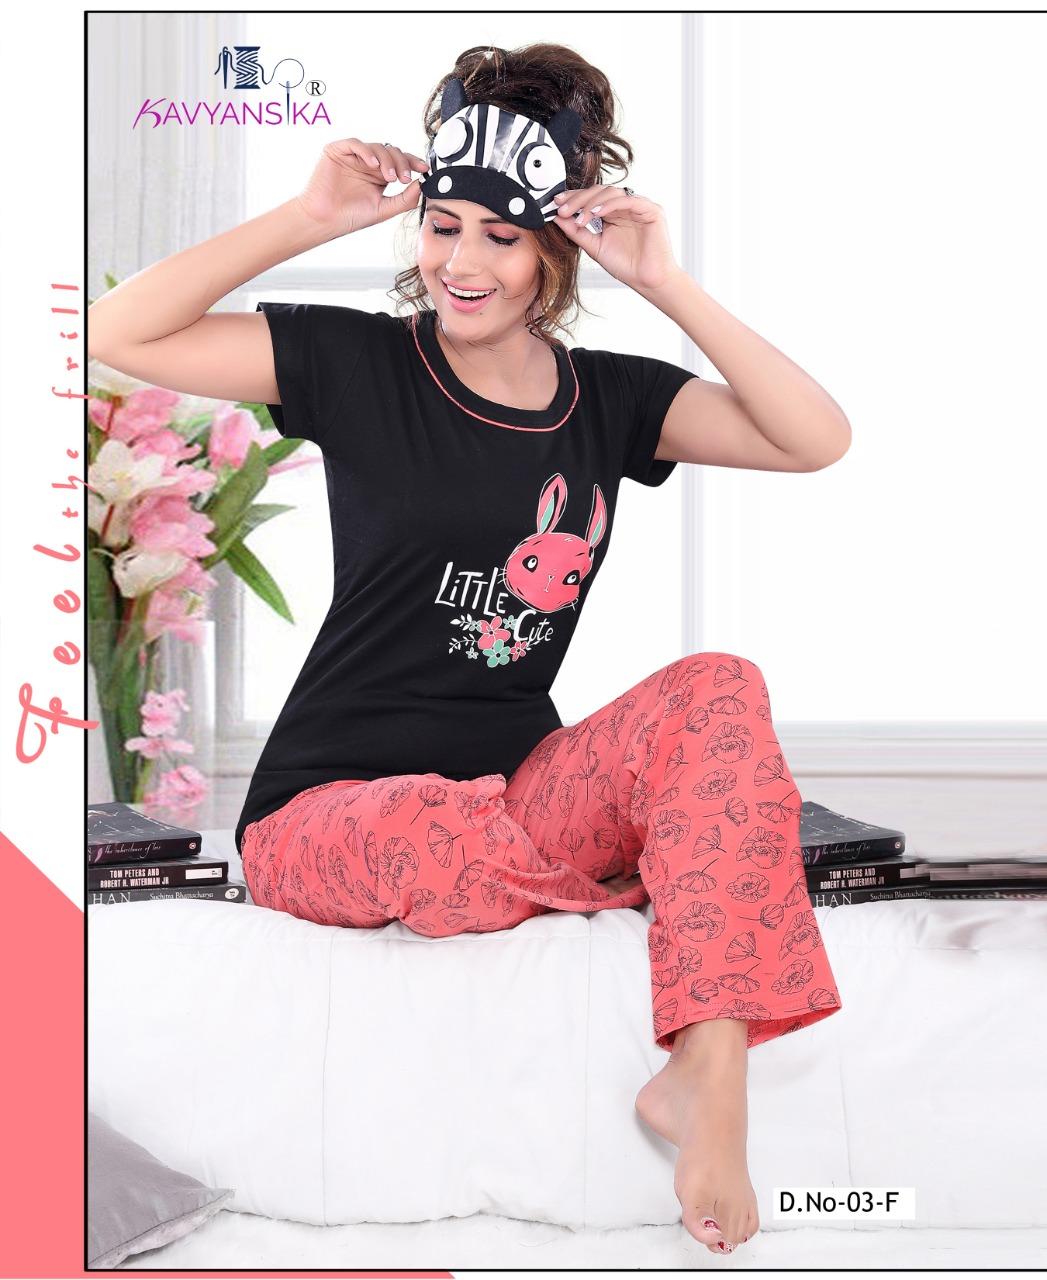 Kavyansika Launch Kavyansika Vol 3 Premium Hosiery Night Suits Wholesaler